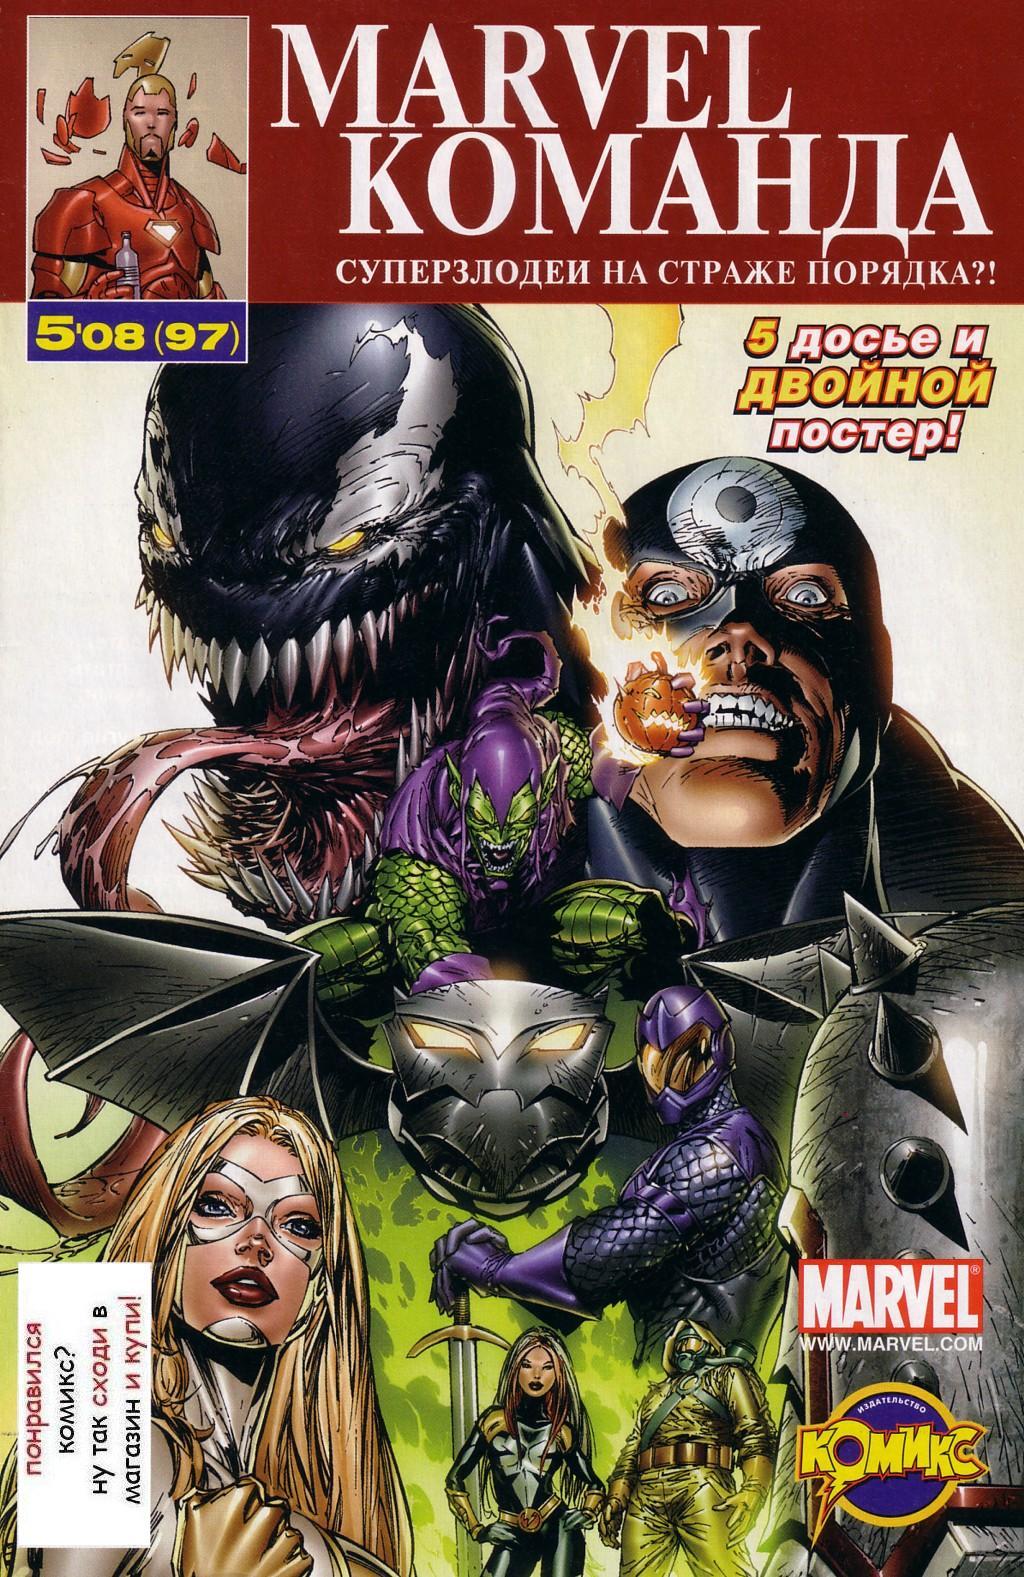 Комиксы Онлайн - Марвел Команда ИДК -  Civil War: The Initiative 01 - Страница №1 - Marvel Команда ИДК - Marvel Команда # 97